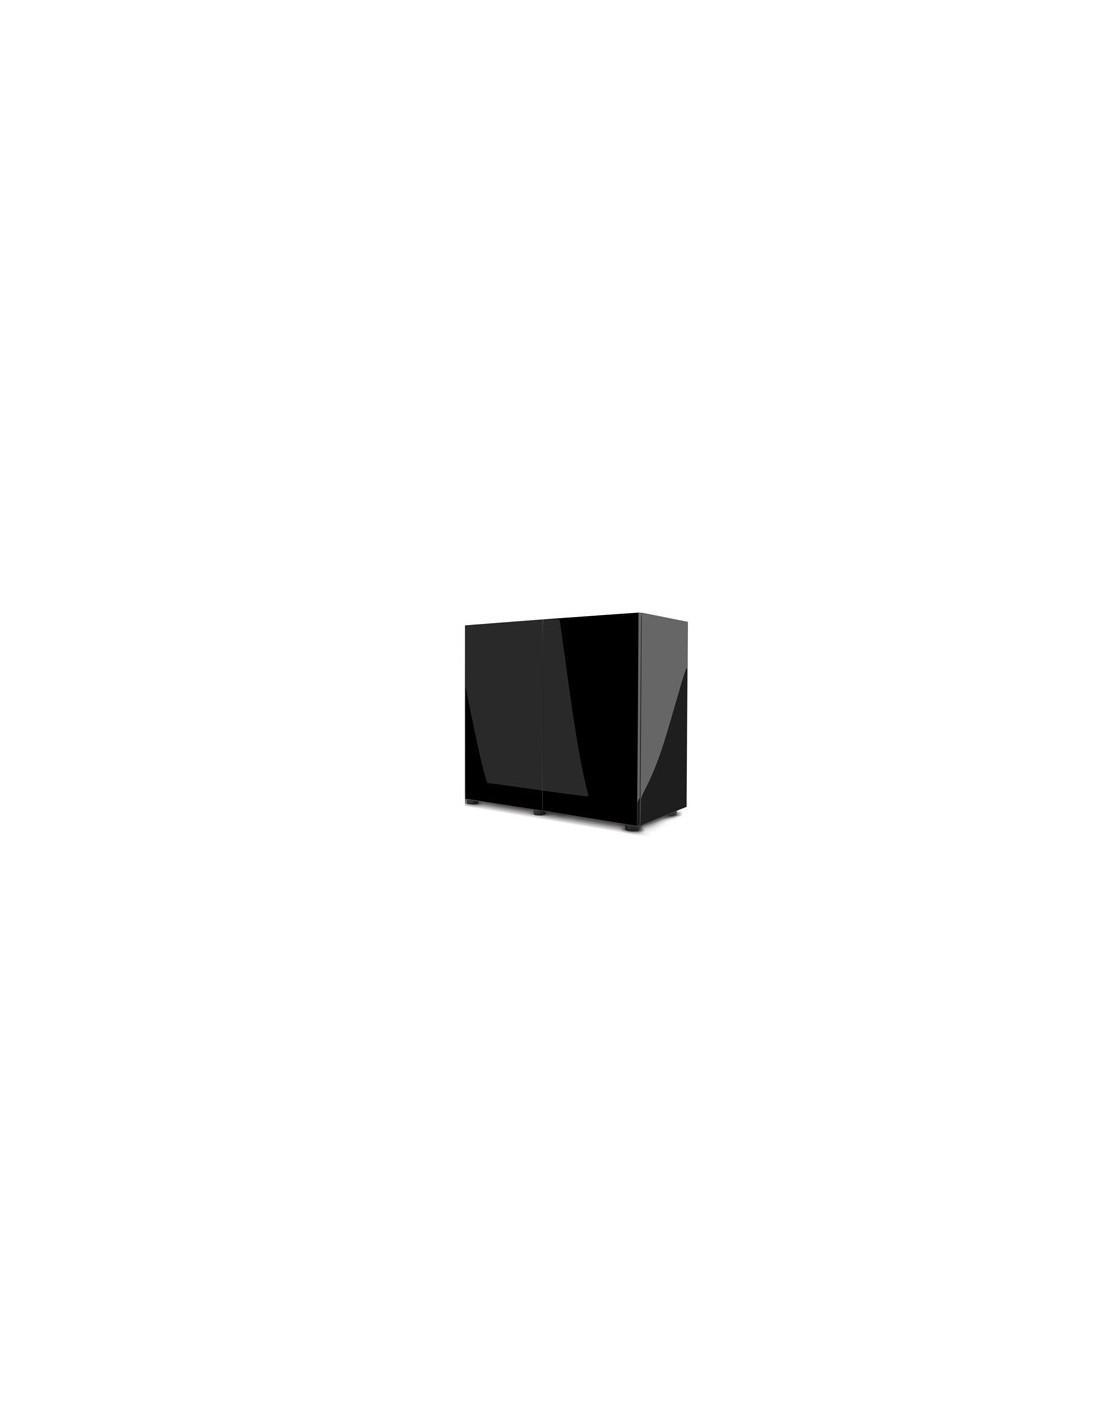 AquaEL Glossy 100 Unterschrank schwarz